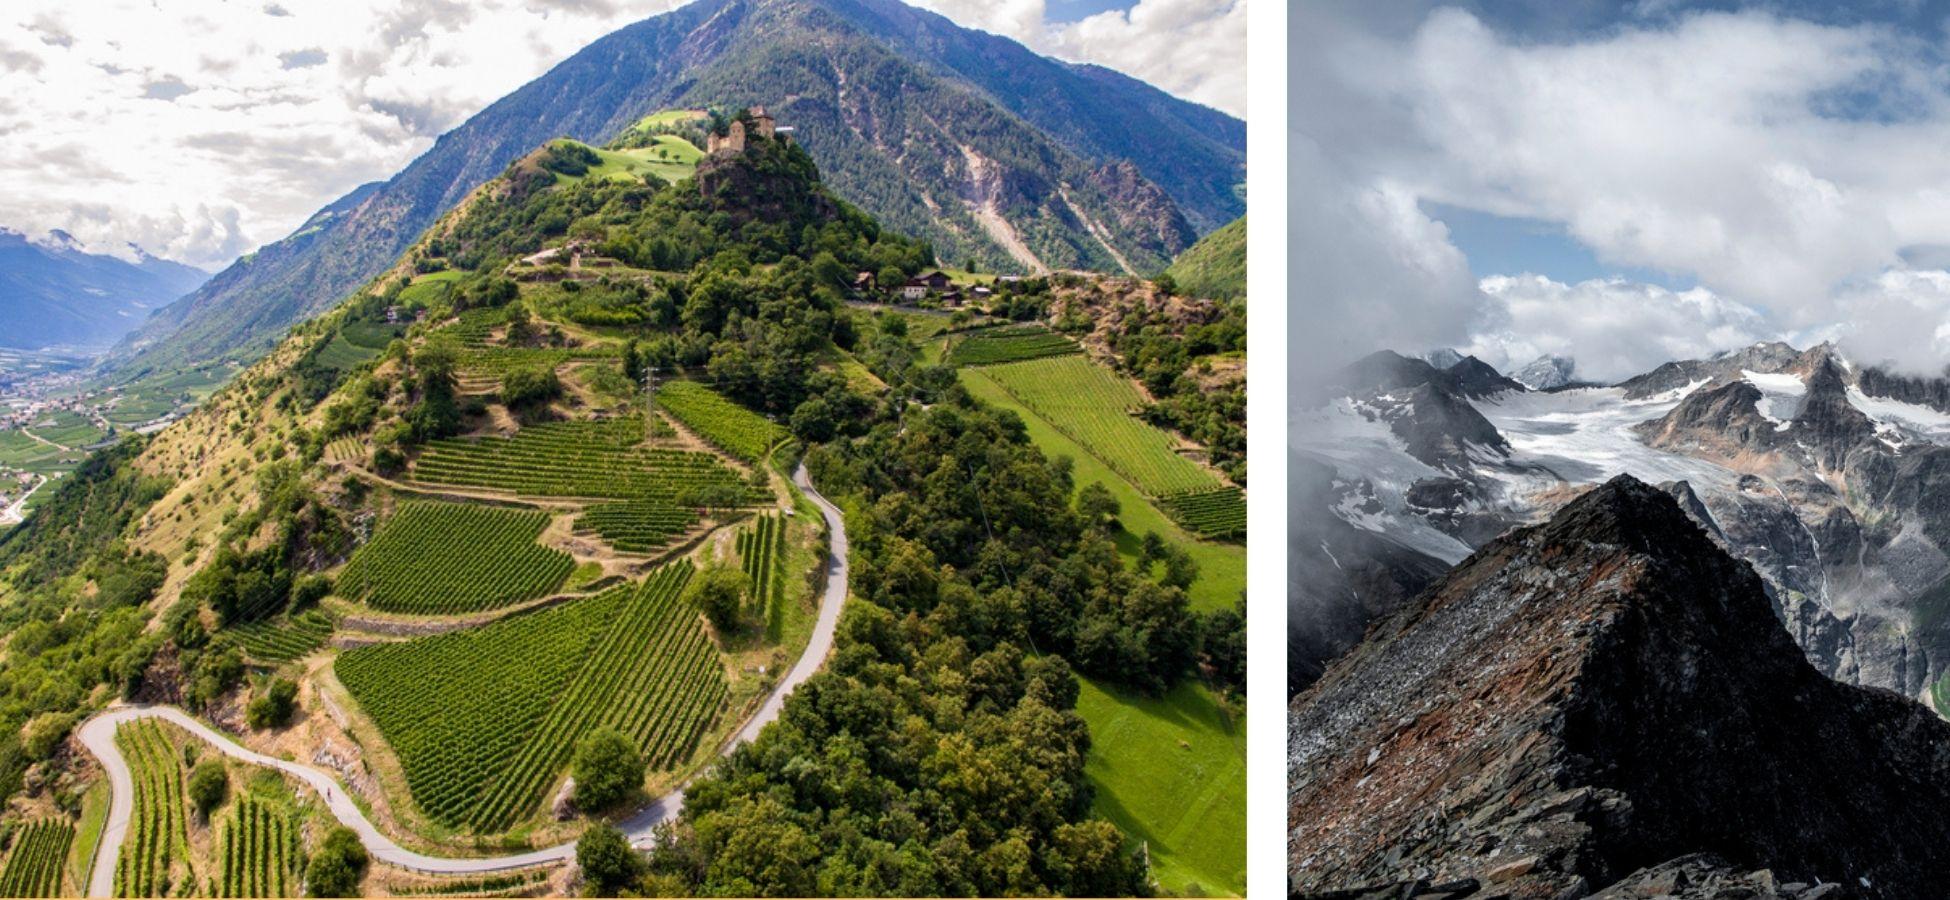 Le Val Venosta, région du Sud-Tyrol